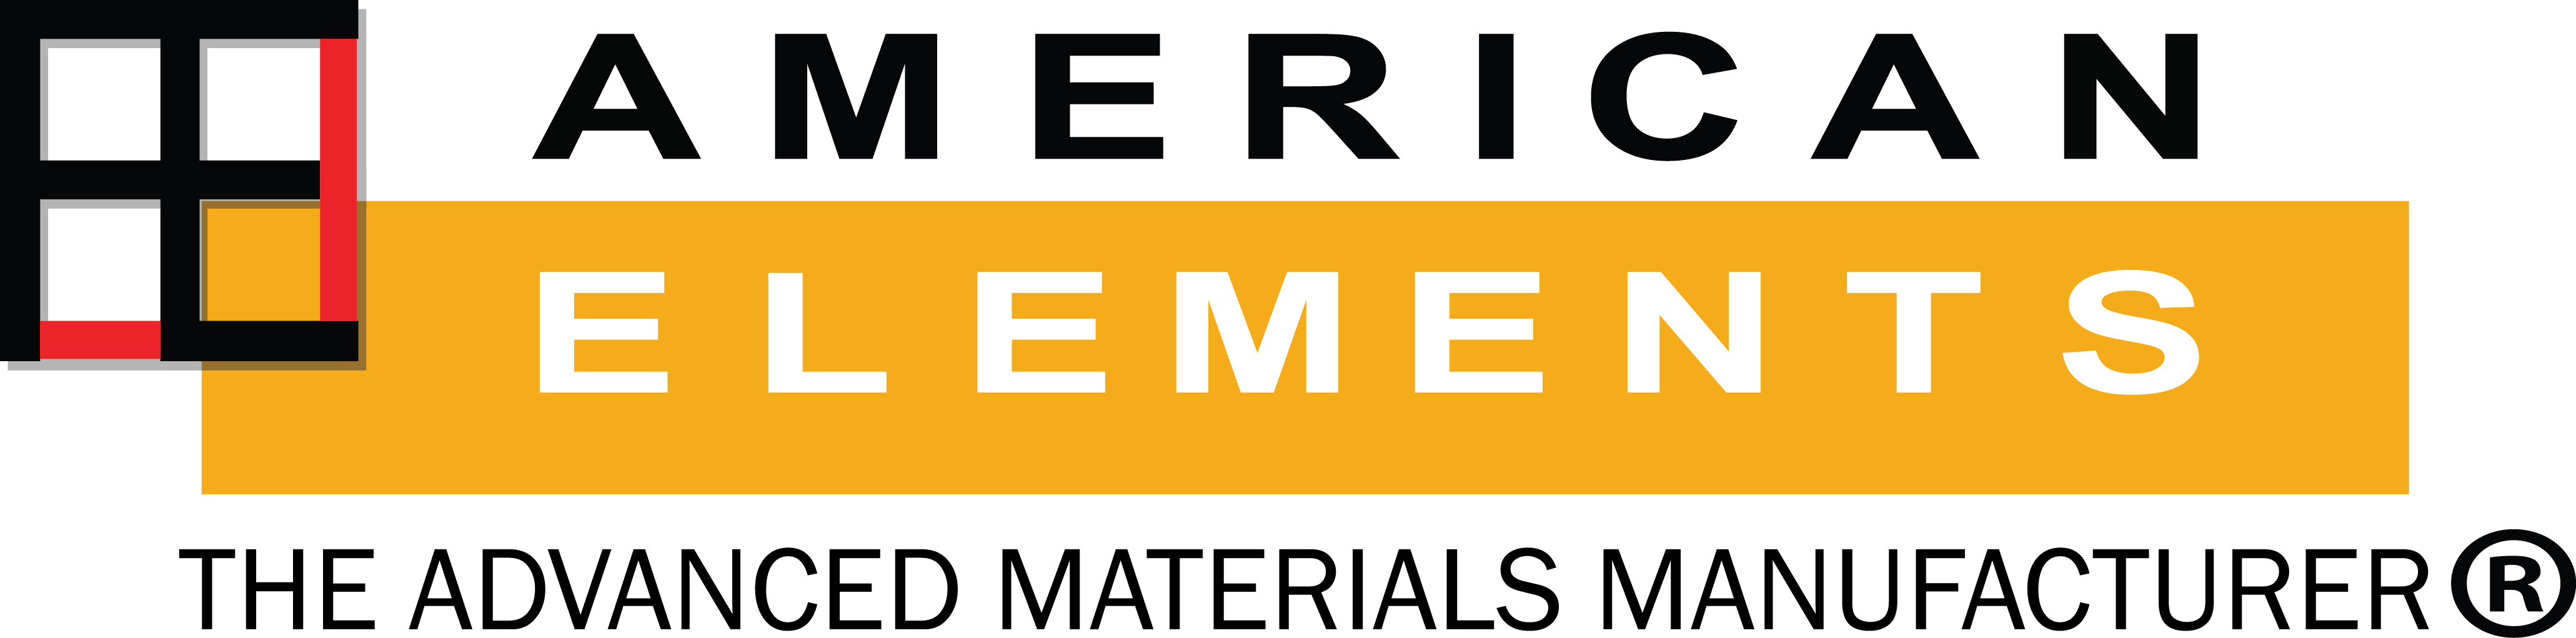 1491488380_AmericanElements-Logo-Display-Sponsorship-EGF2017.png